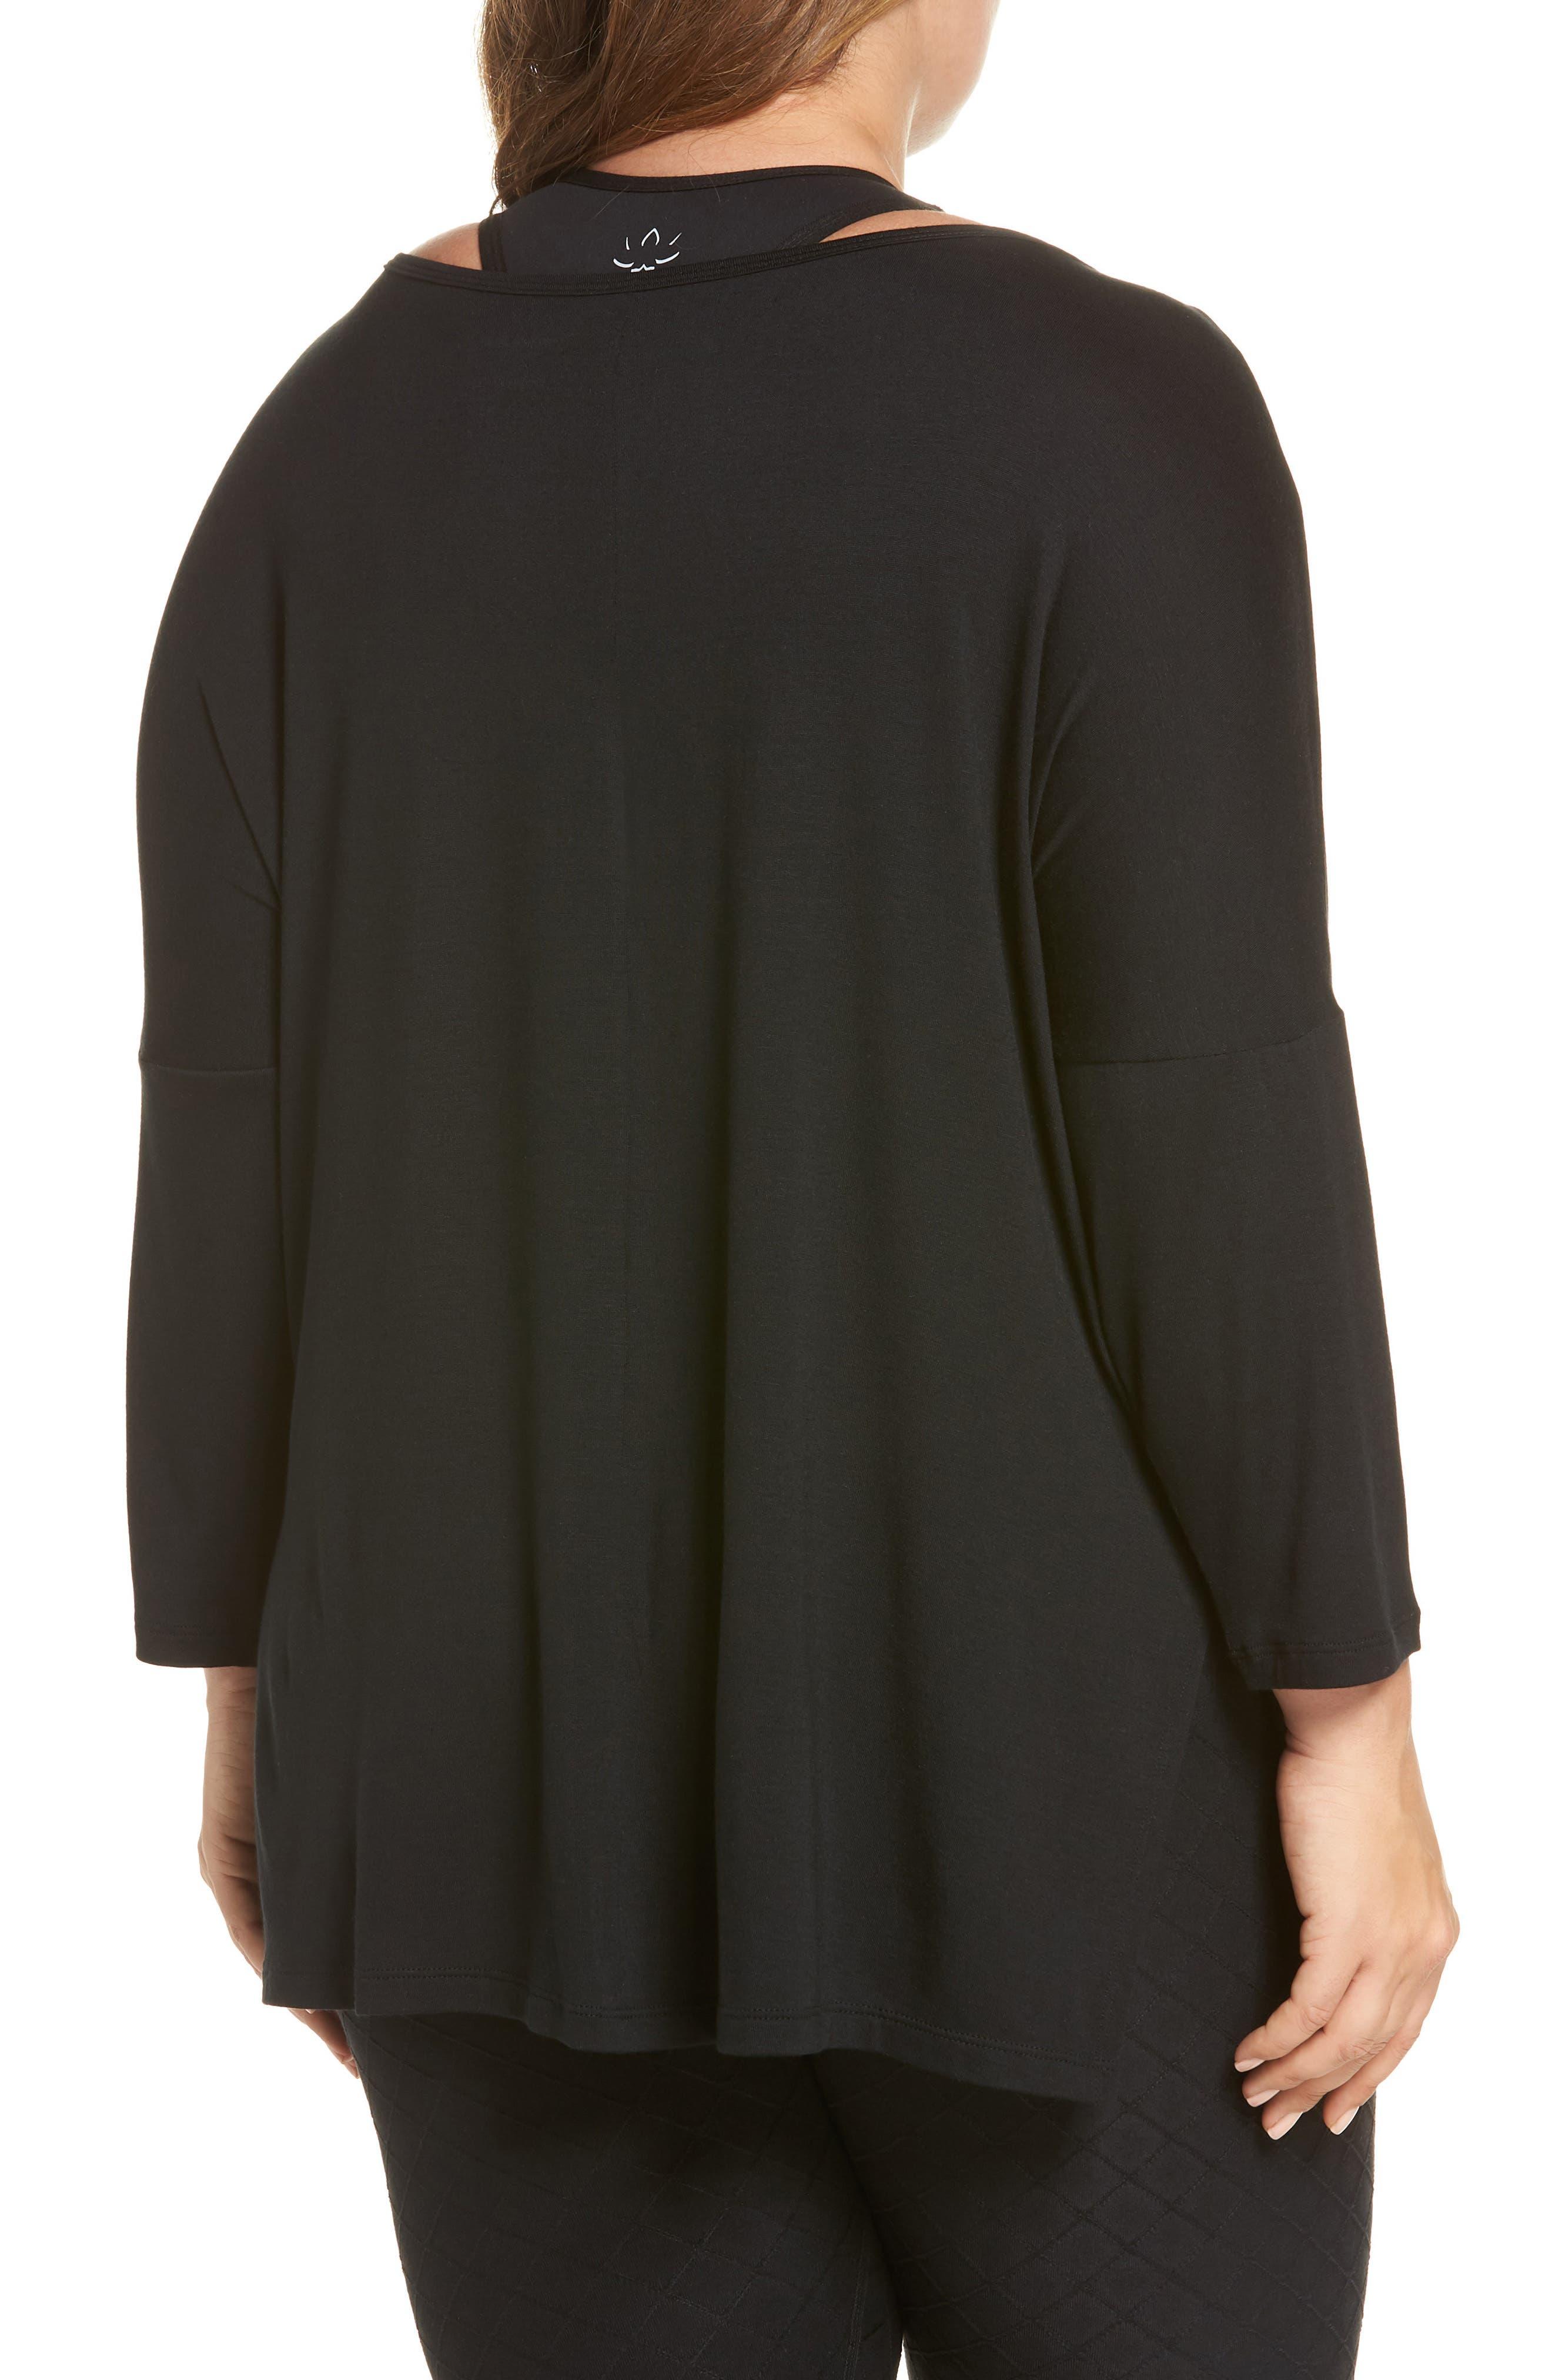 Slink It Boxy Pullover,                             Alternate thumbnail 2, color,                             BLACK